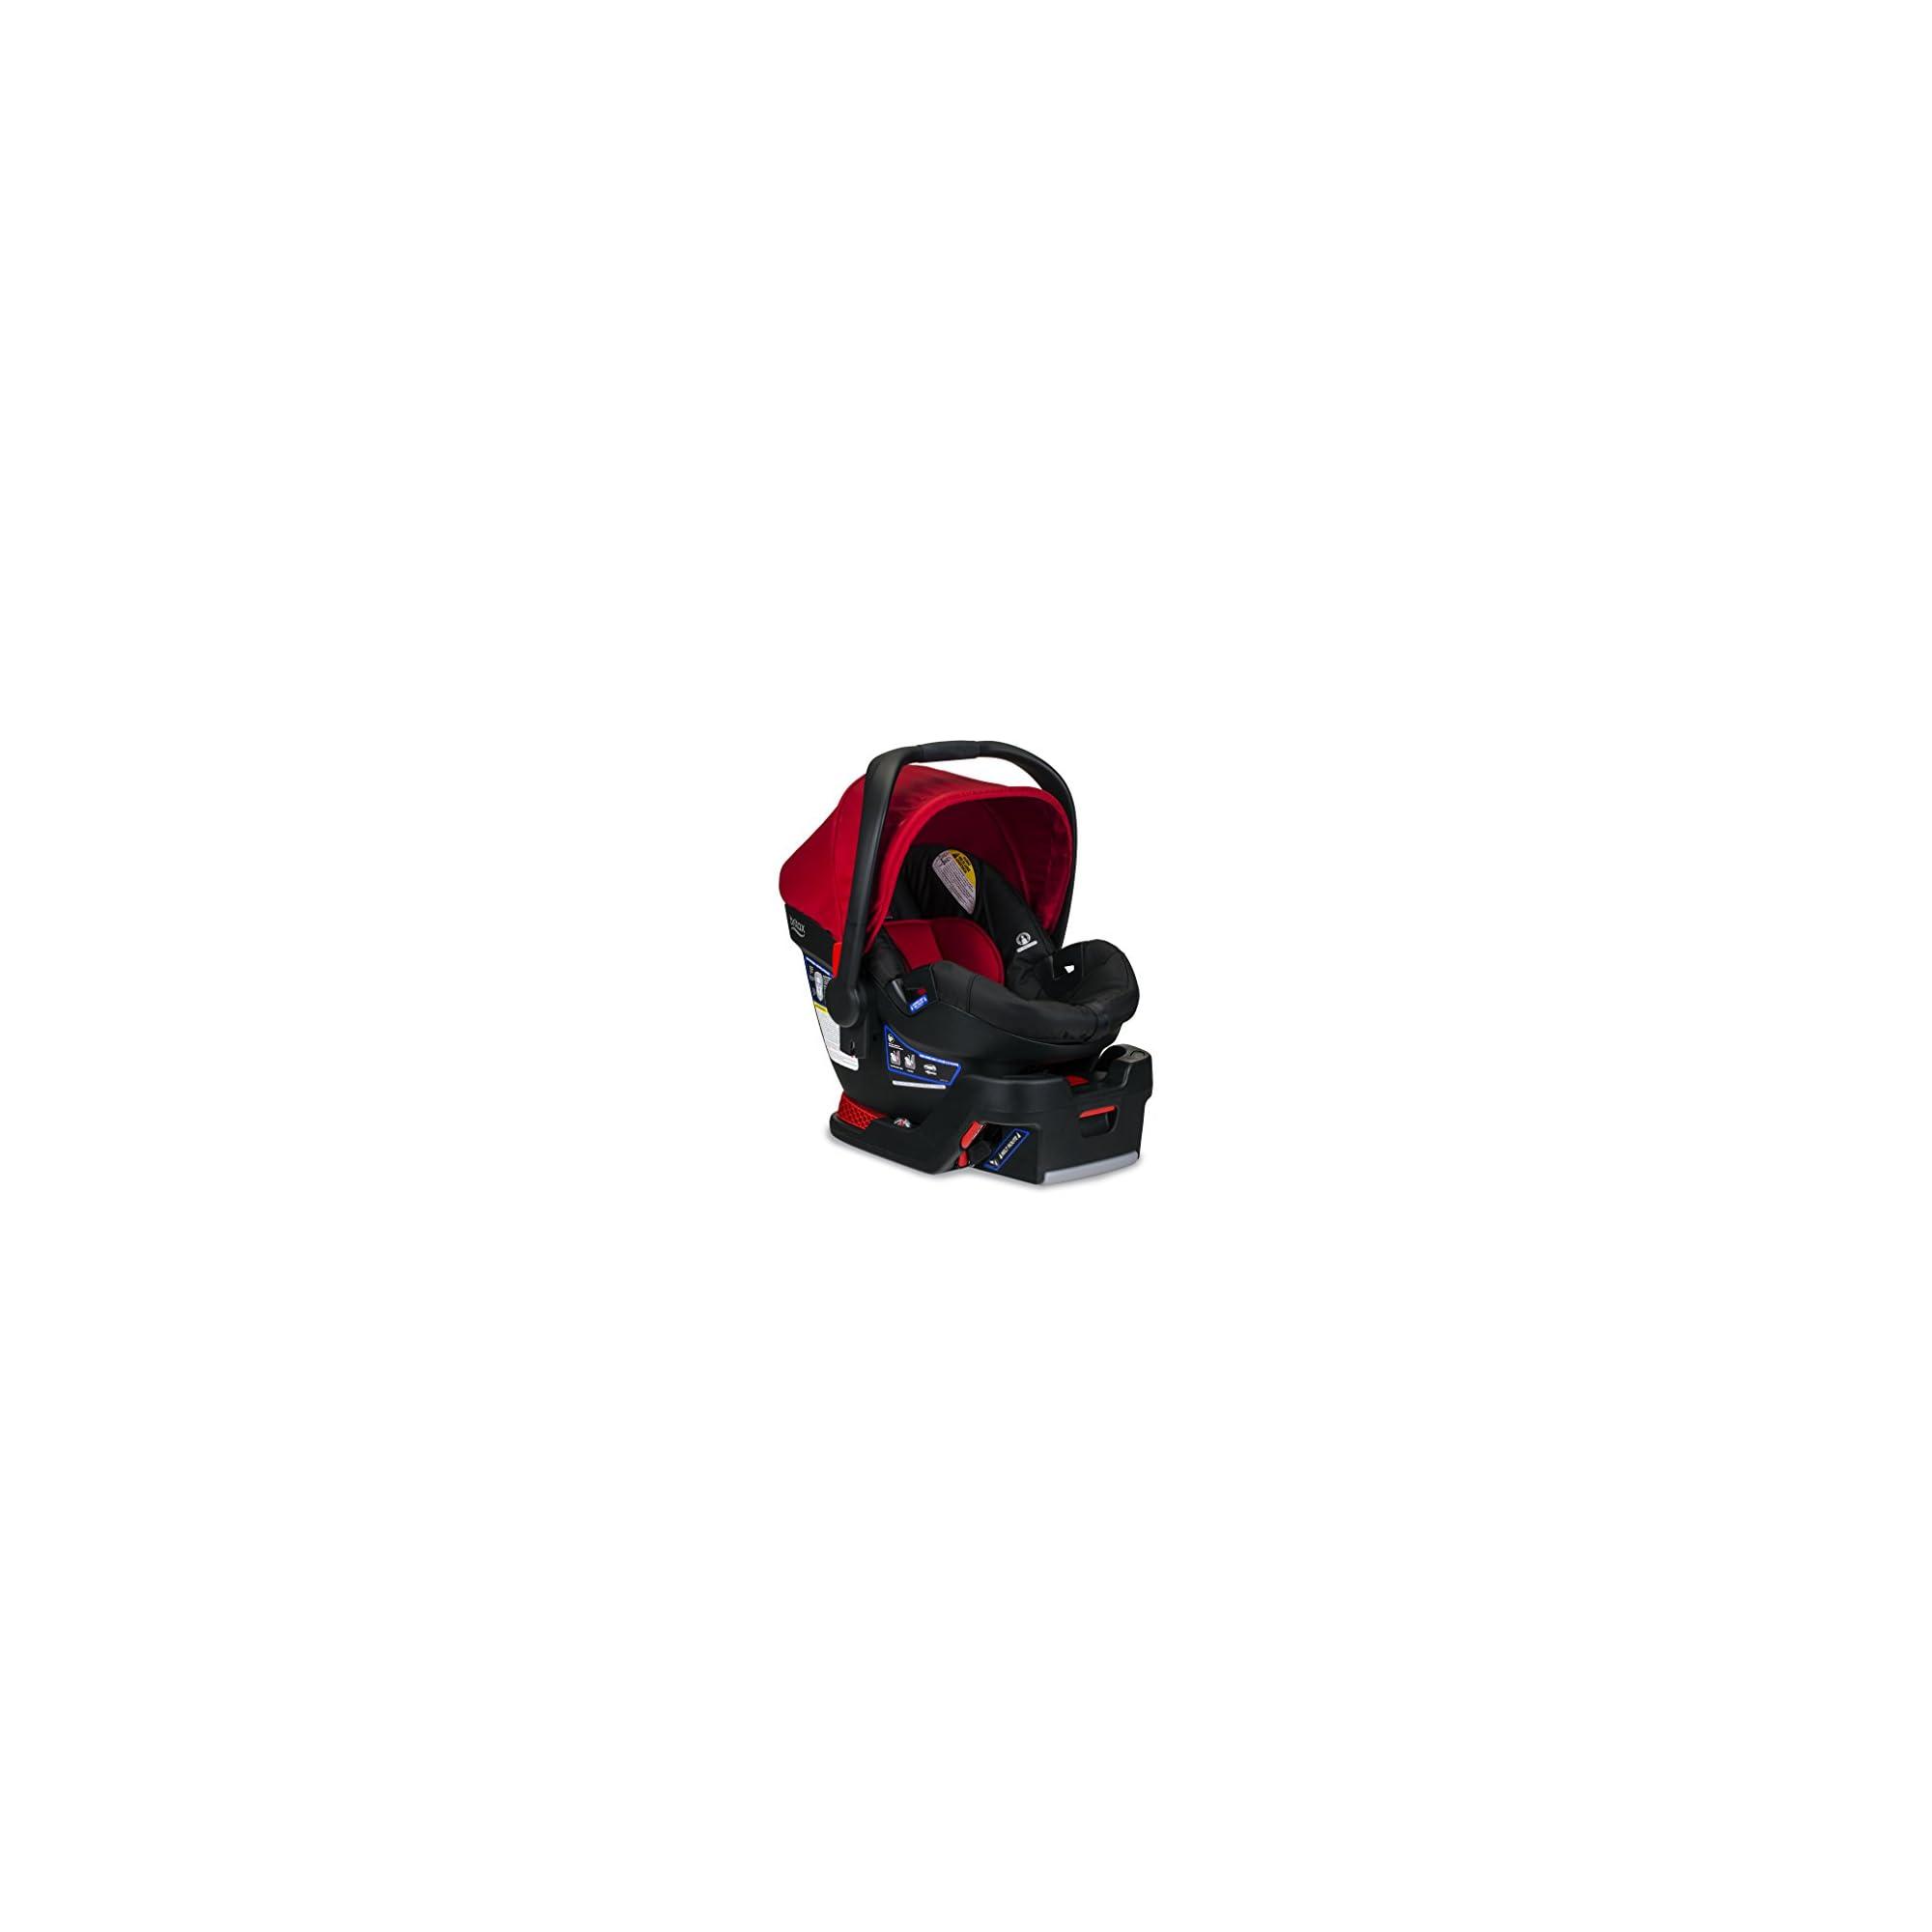 Britax B-Safe 35 Infant Car Seat – Rear Facing | 4 to 35 Pounds – Reclinable Base, 1 Layer Impact Protection, Cardinal